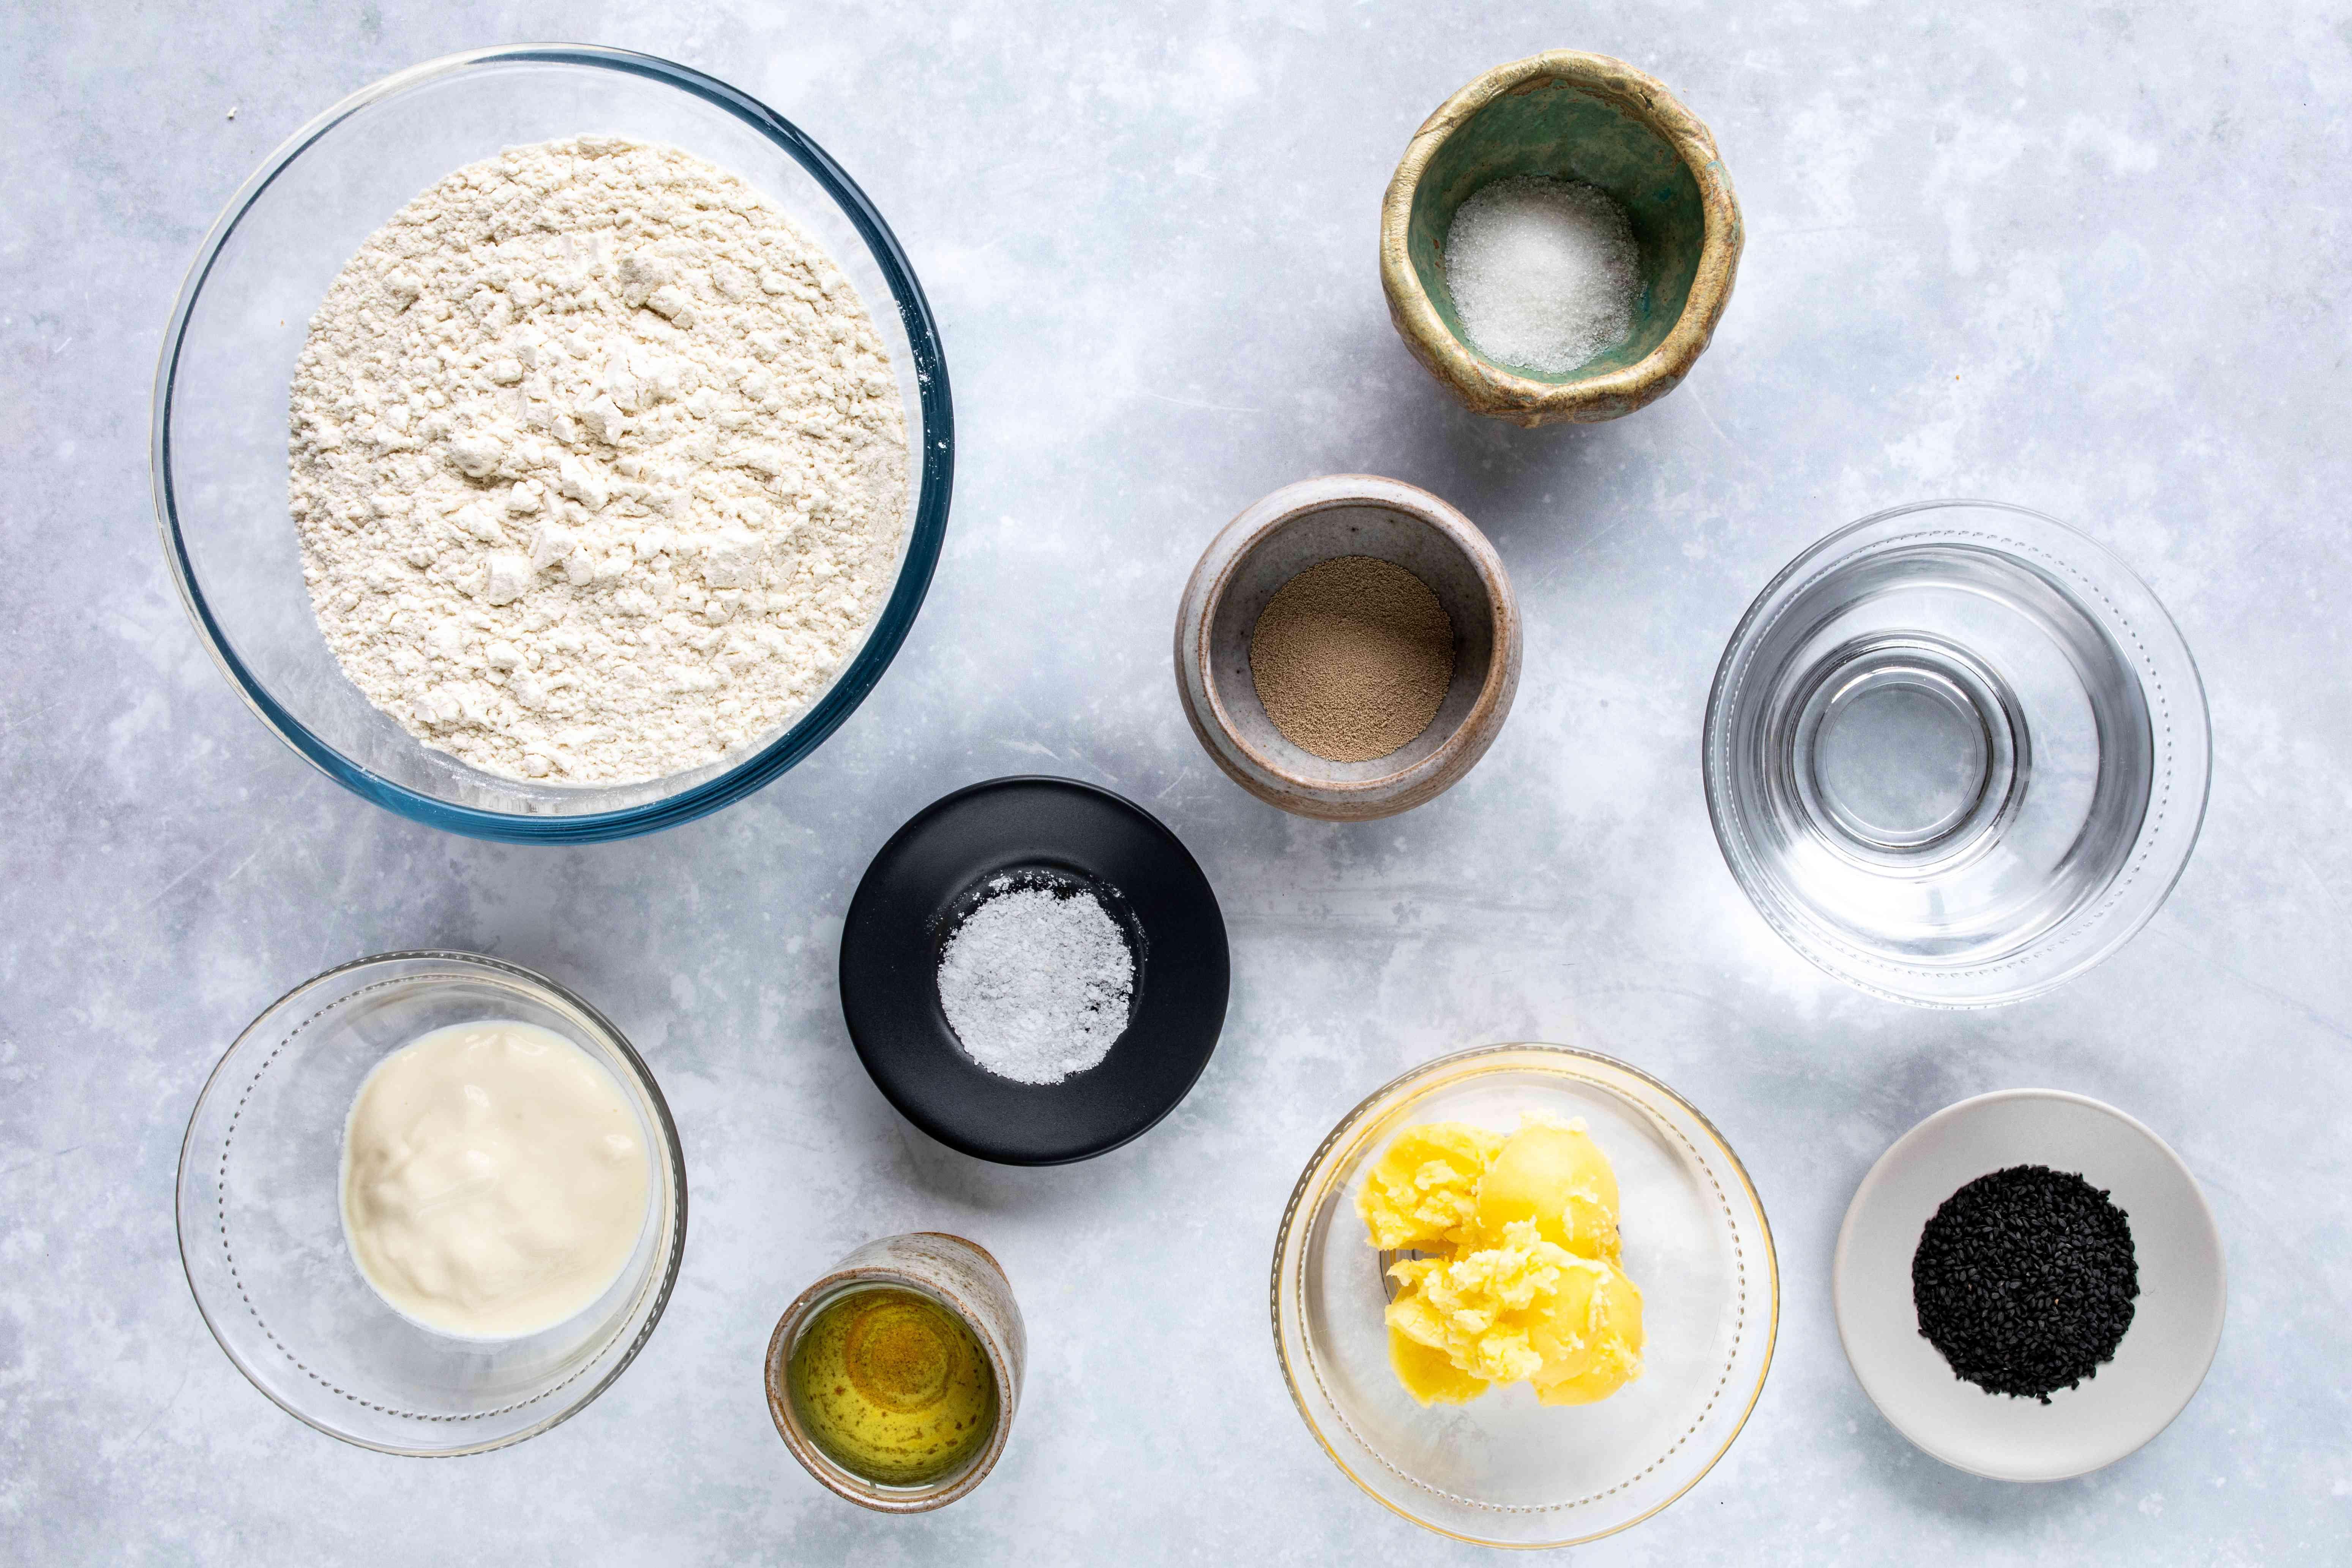 Ingredients for naan leavened Indian flatbread